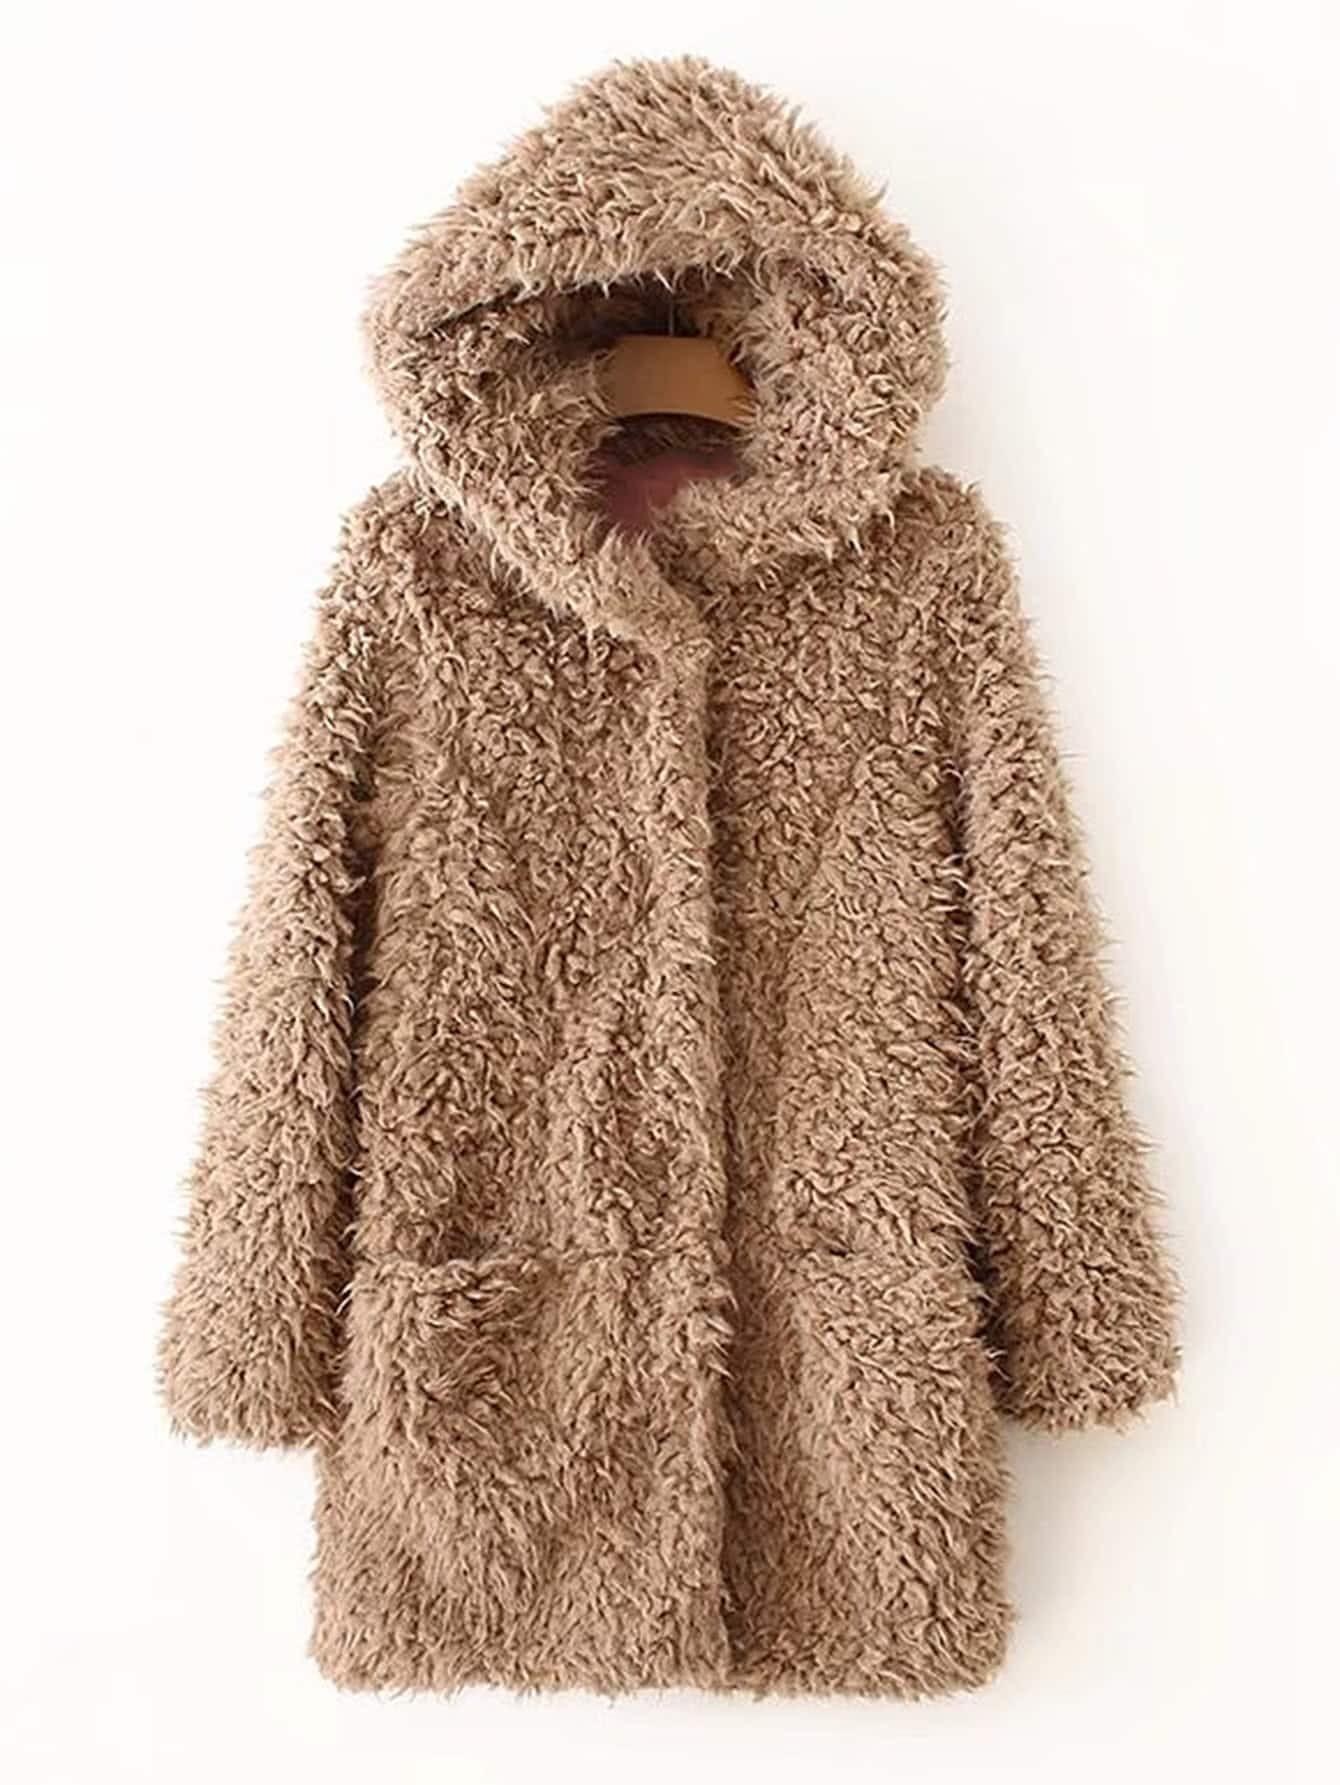 Faux Fur Hooded Coat -SheIn(Sheinside)